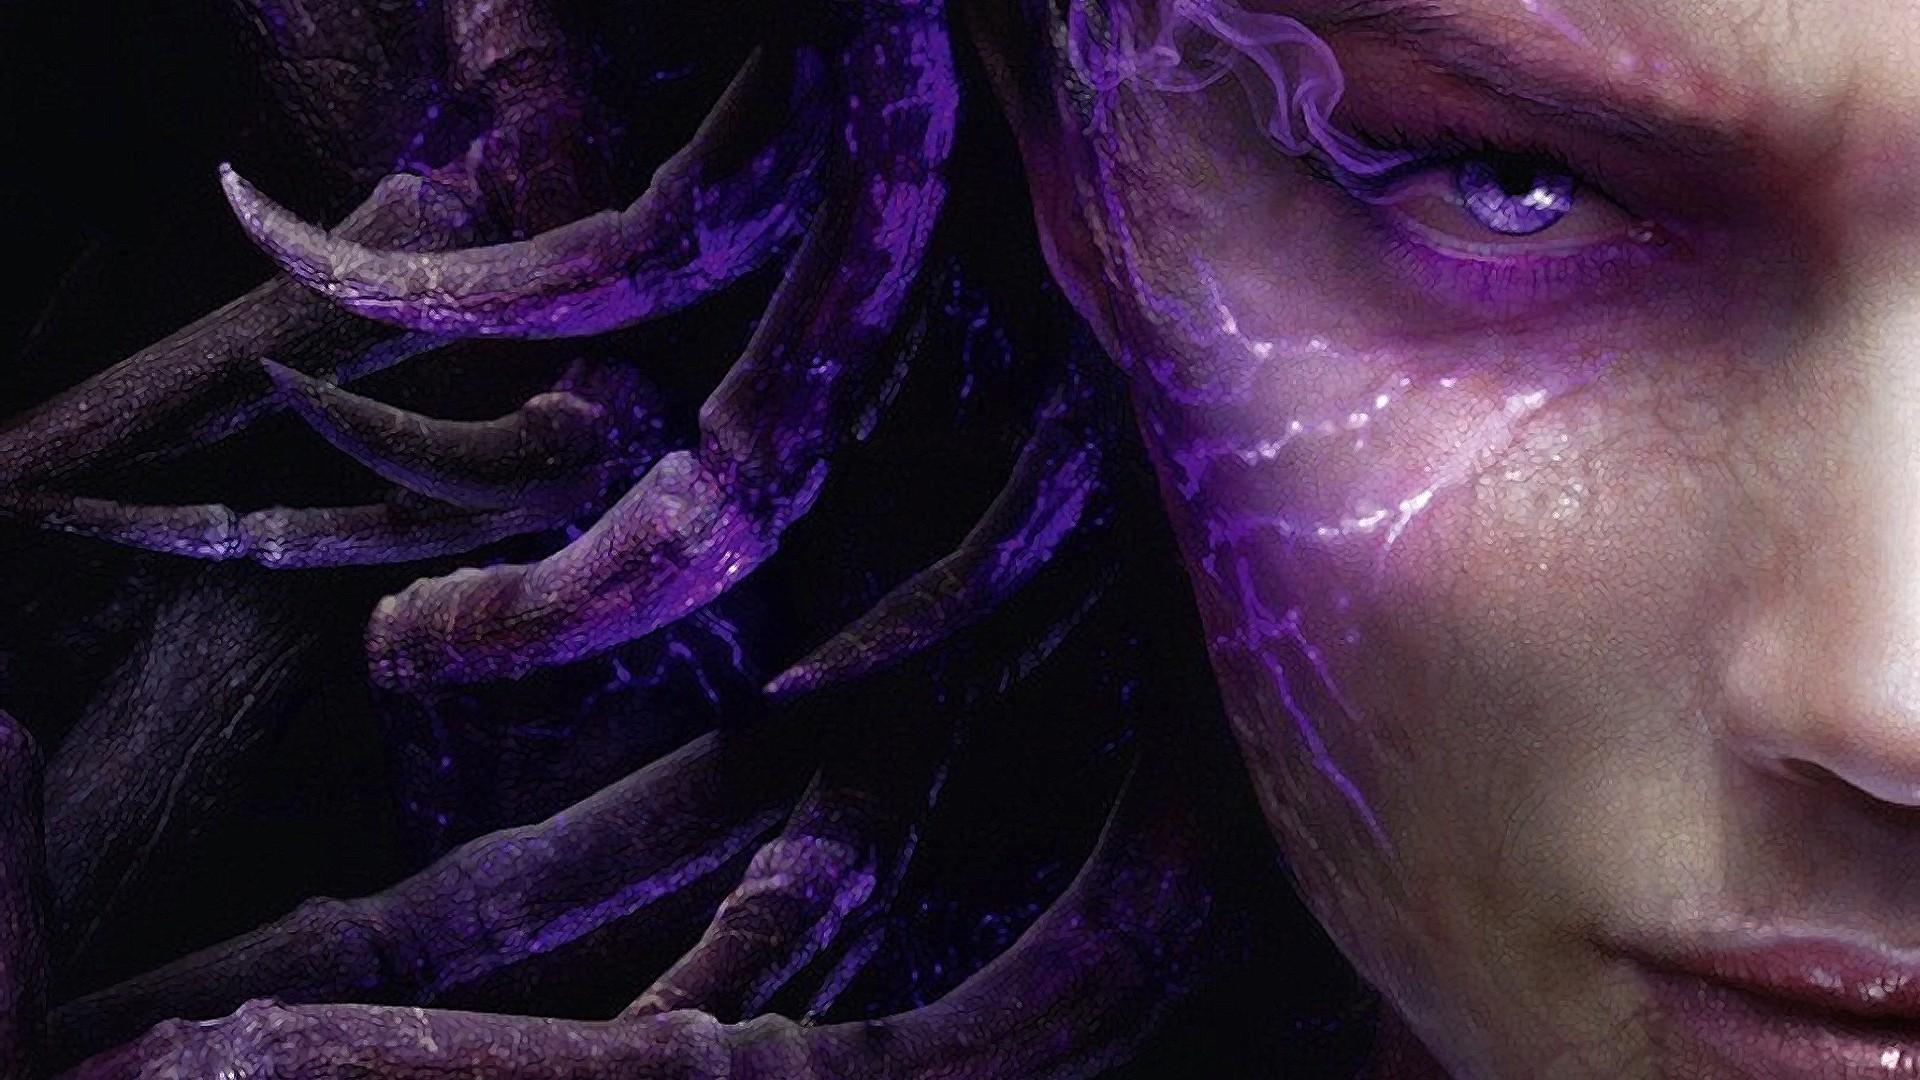 Starcraft ii heart of the swarm hd wallpaper background - Sarah kerrigan wallpaper ...